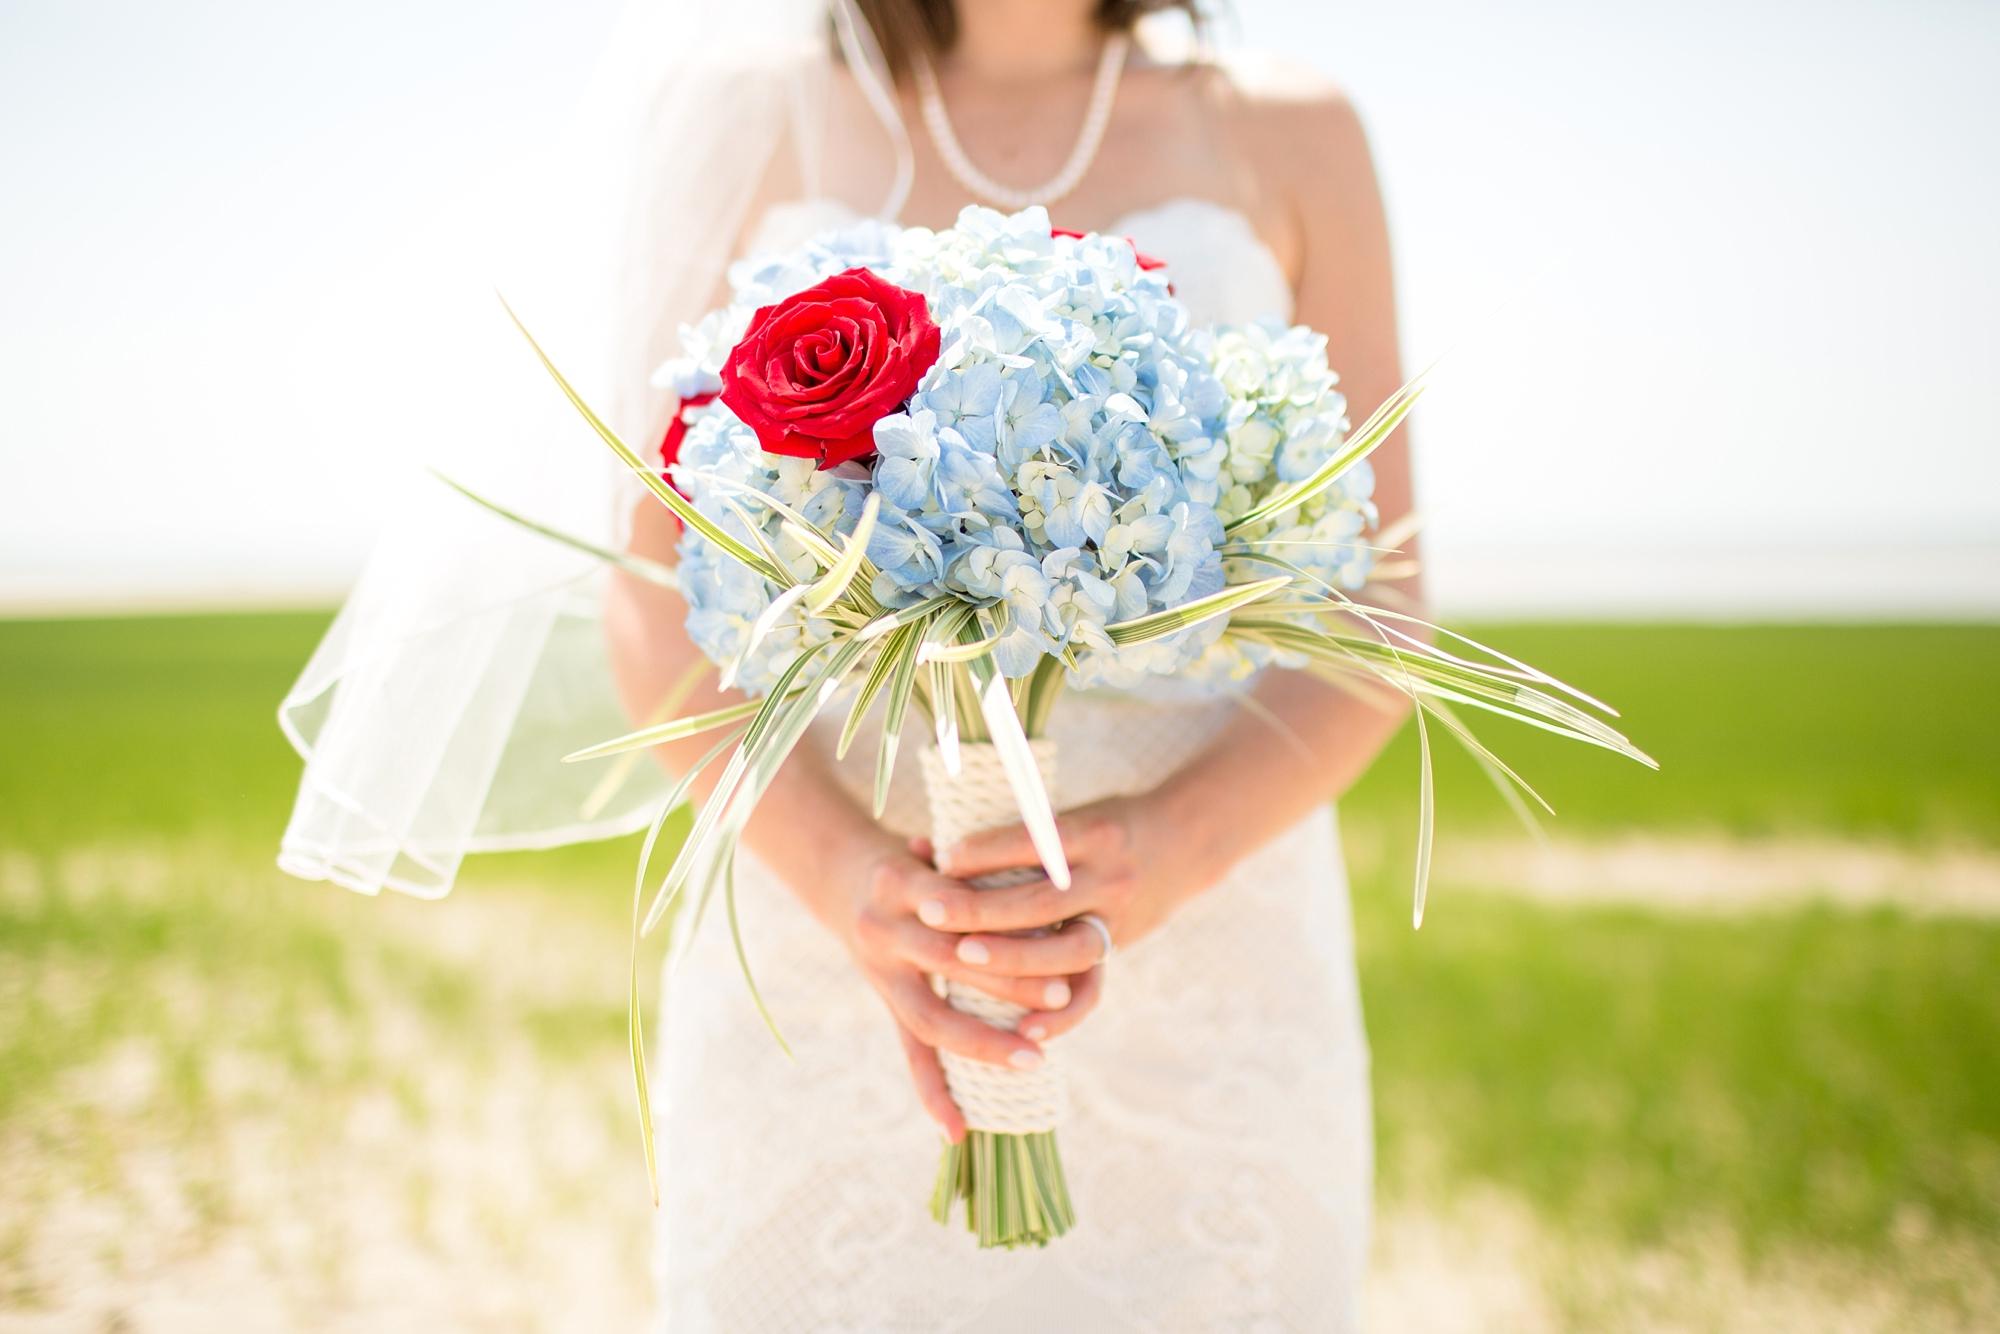 Gorgeous bouquet Katherine!